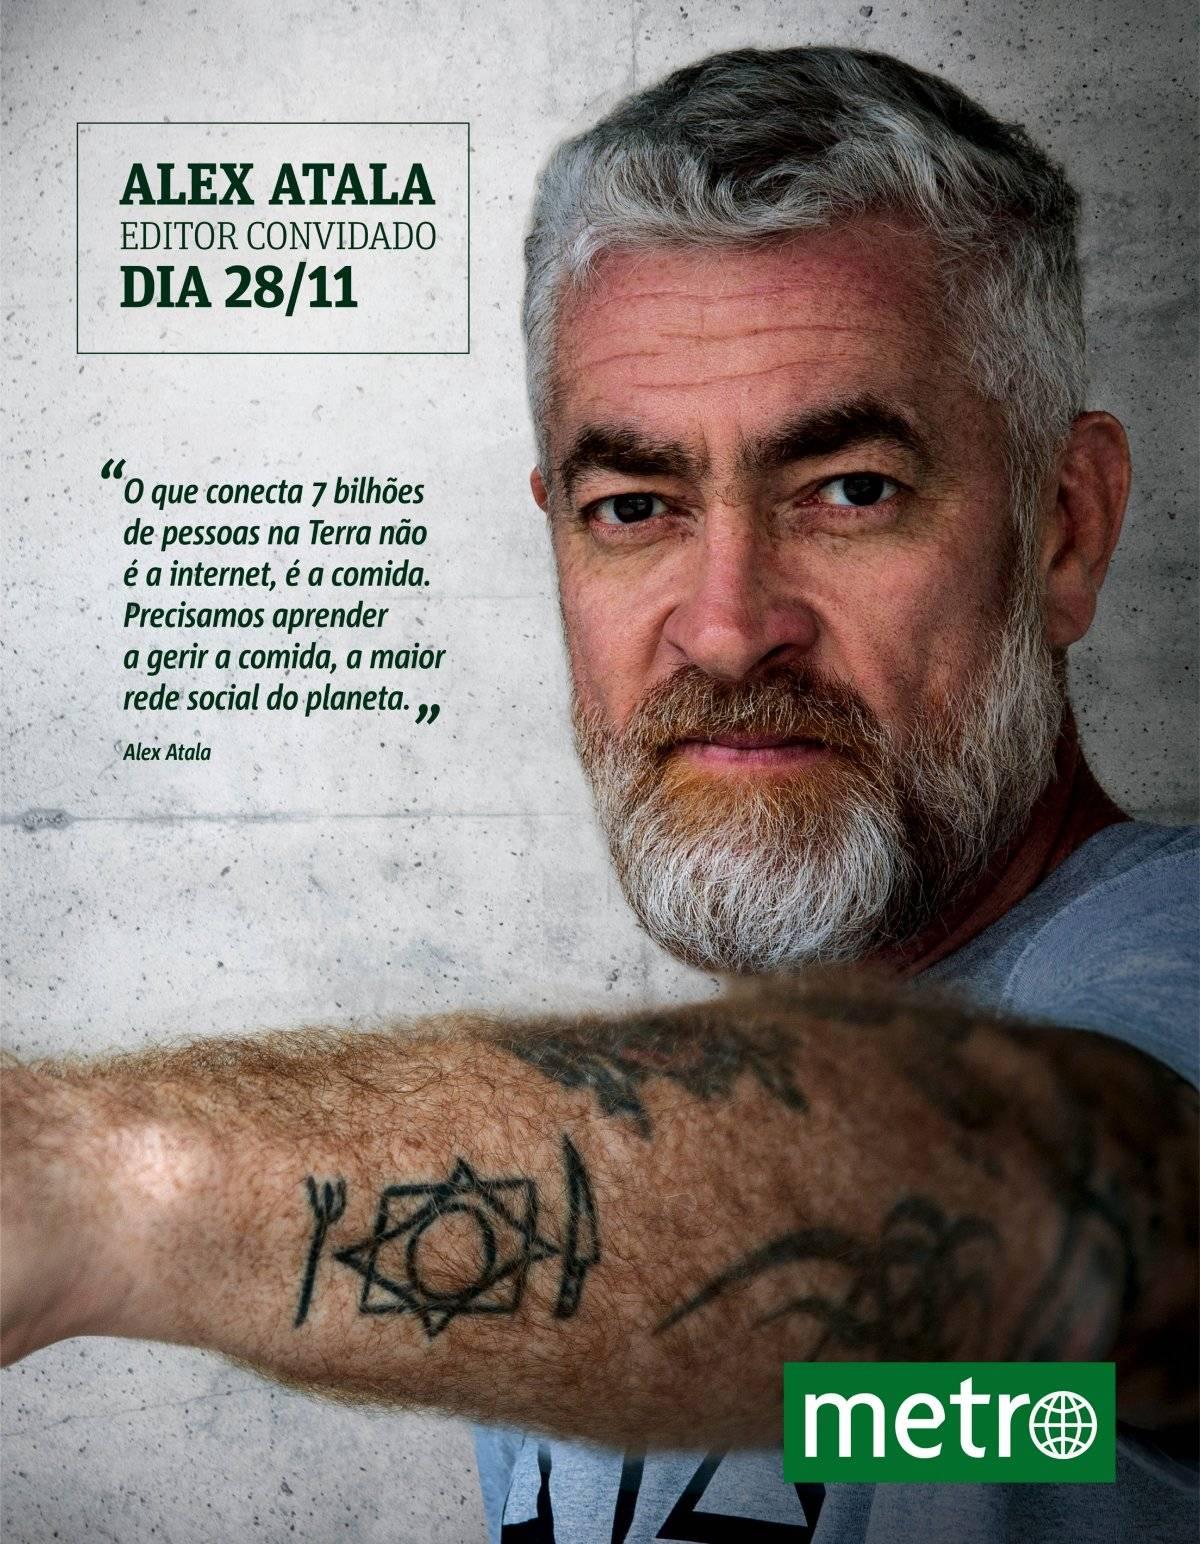 Alex Atala editor convidado Metro Jornal